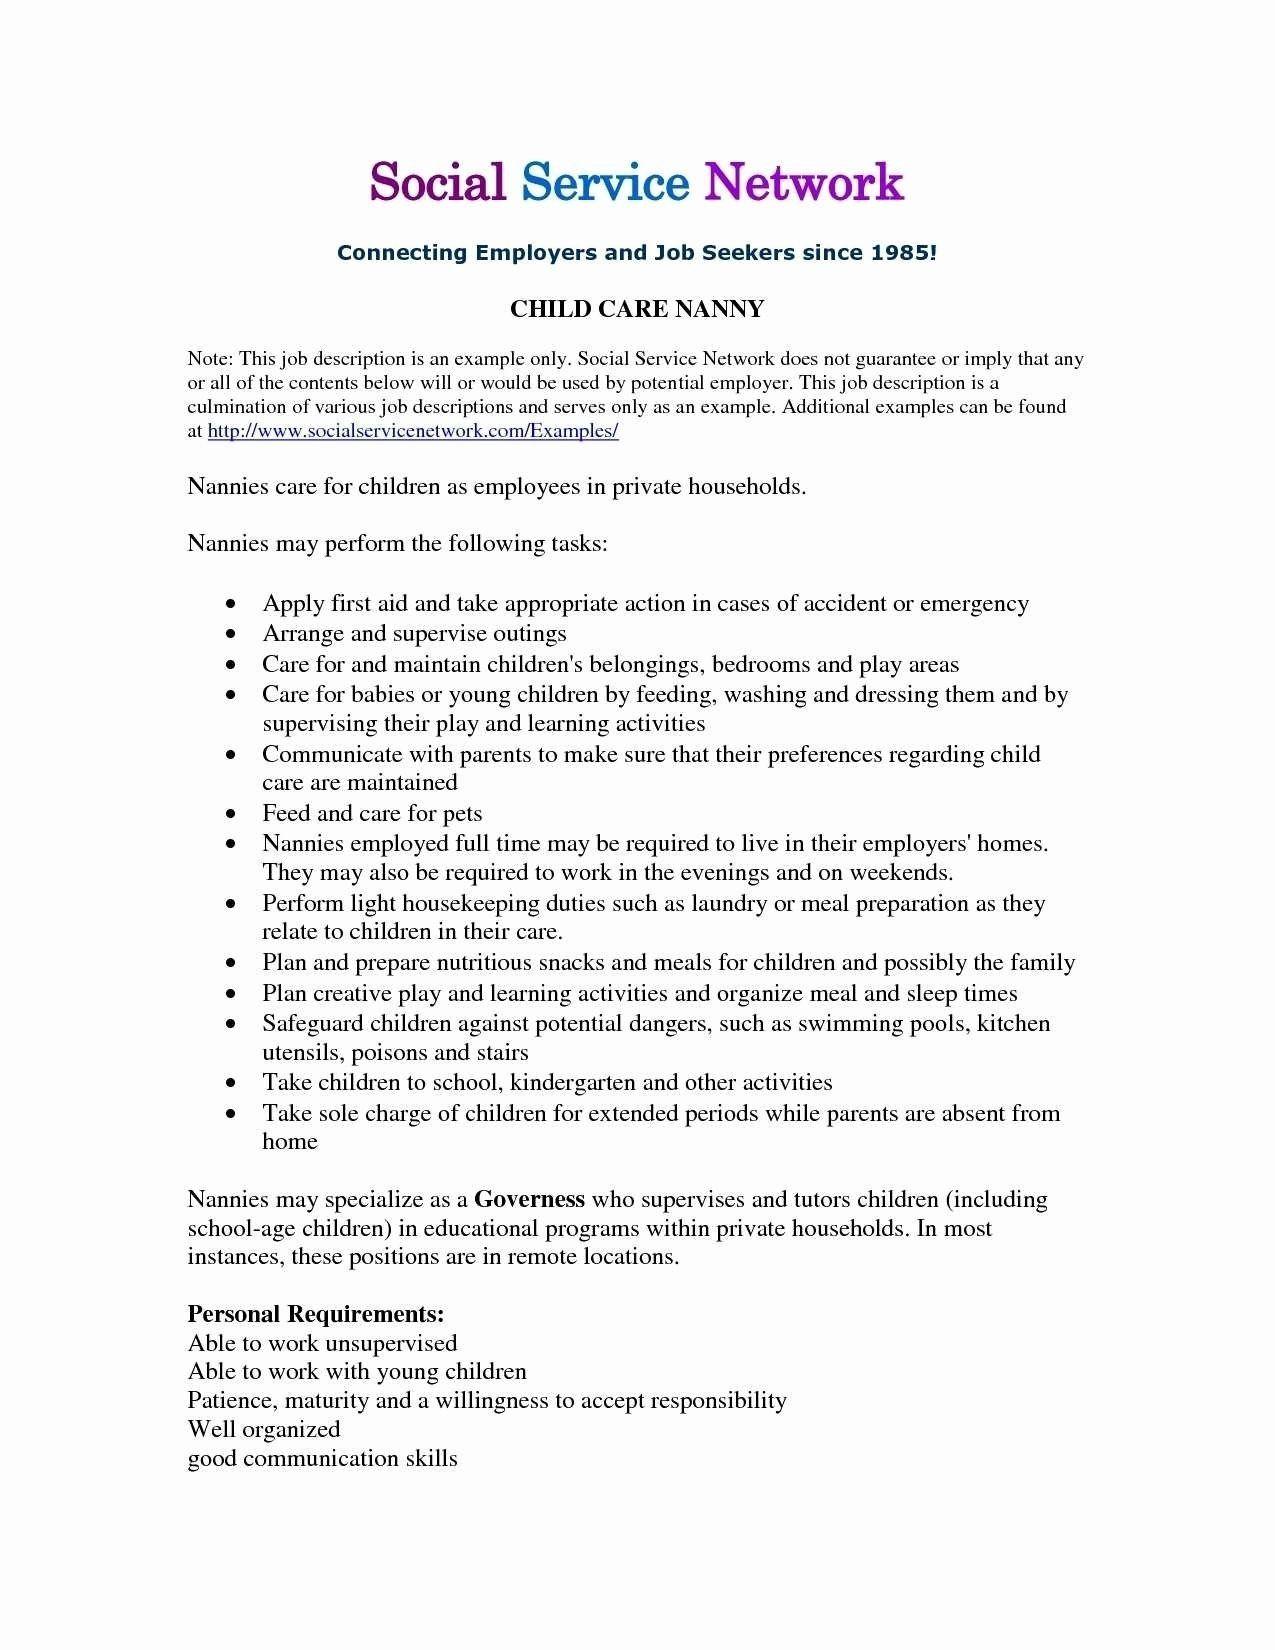 Babysitter Job Description For Resume Unique Baby Sitter Resume Sample Fresh Babysitter Resume Nanny Job Description Job Resume Examples Nanny Jobs